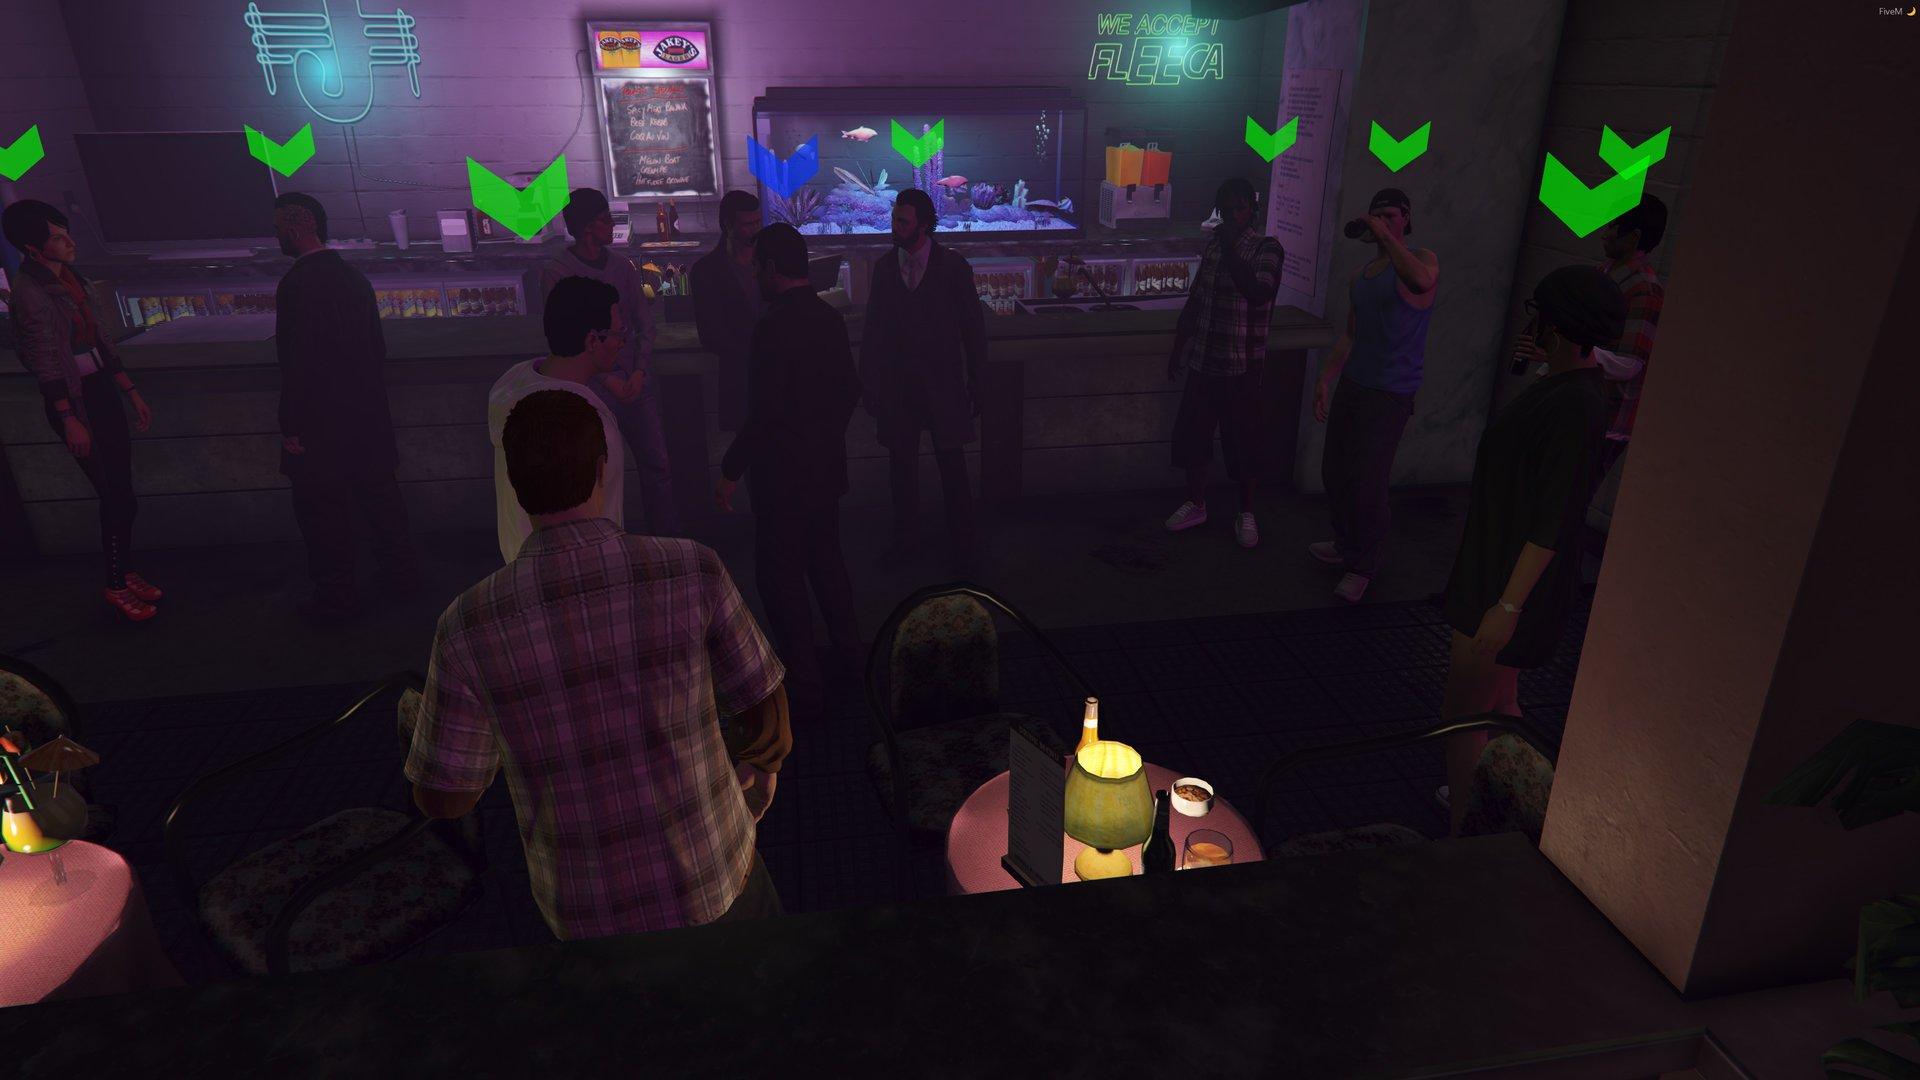 Group Party at the V.U. !